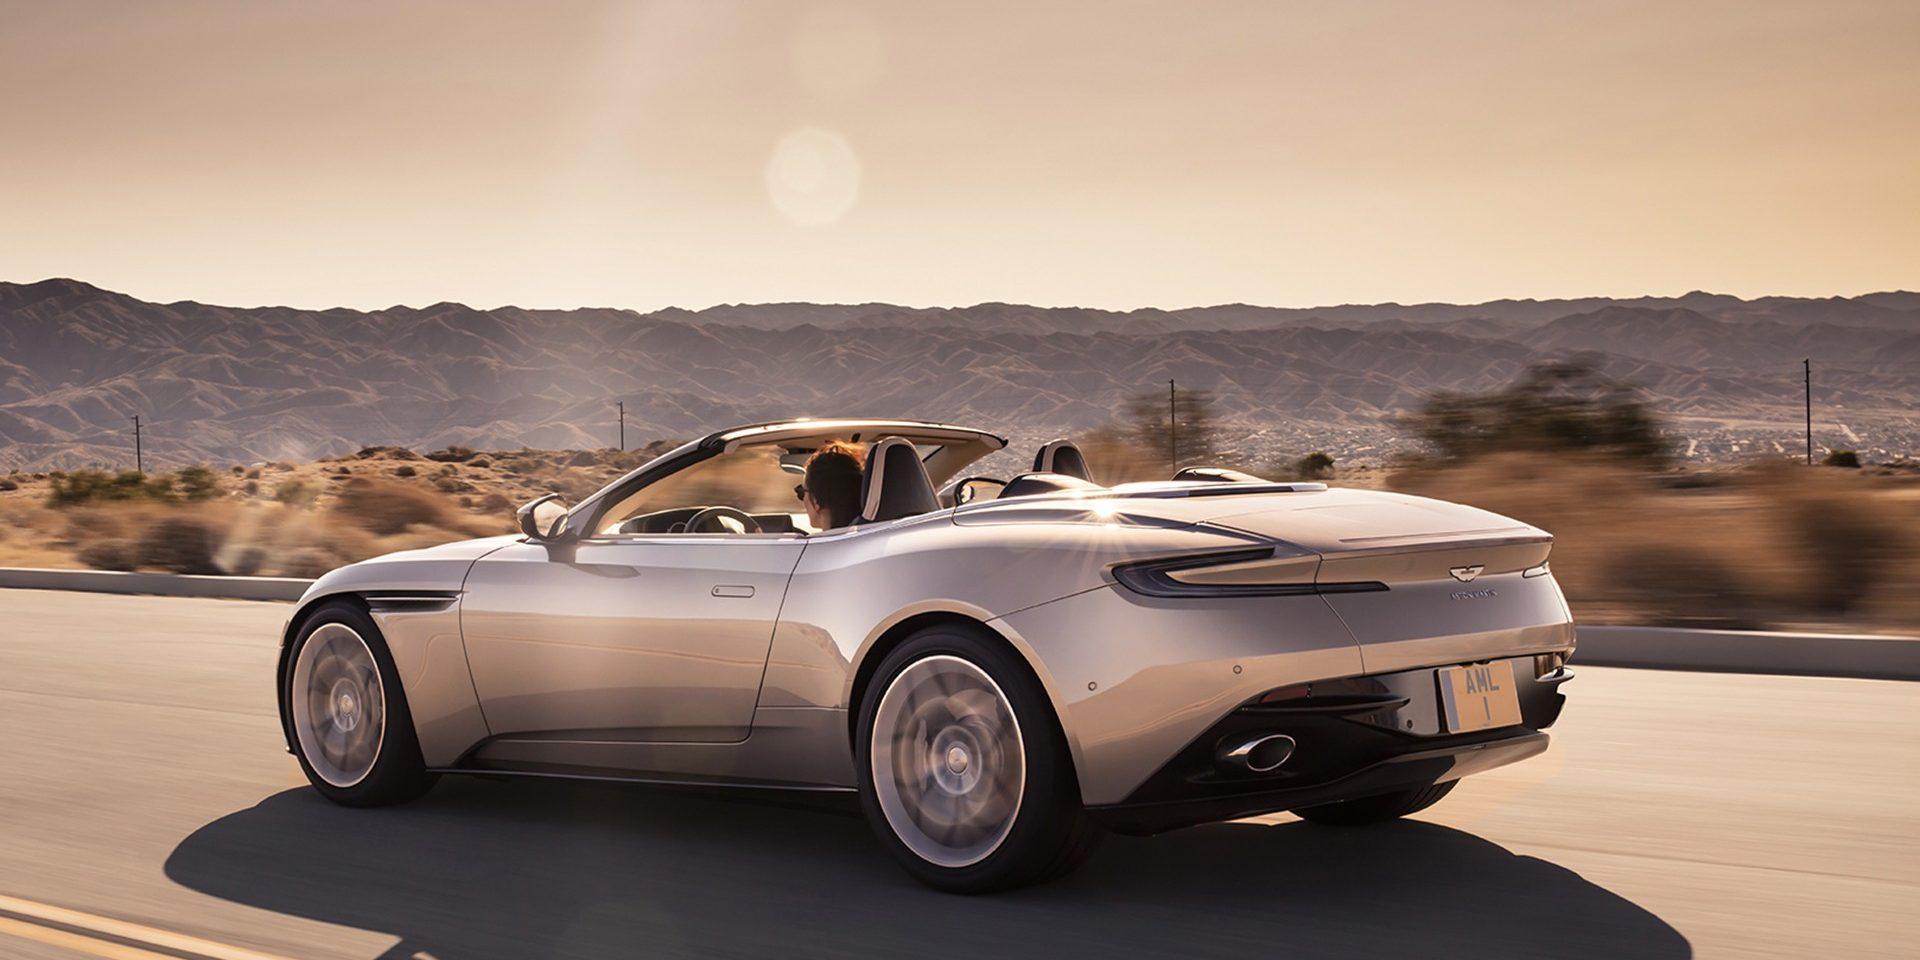 Aston Martin DB11 Volante - Encore mieux que le coupé !